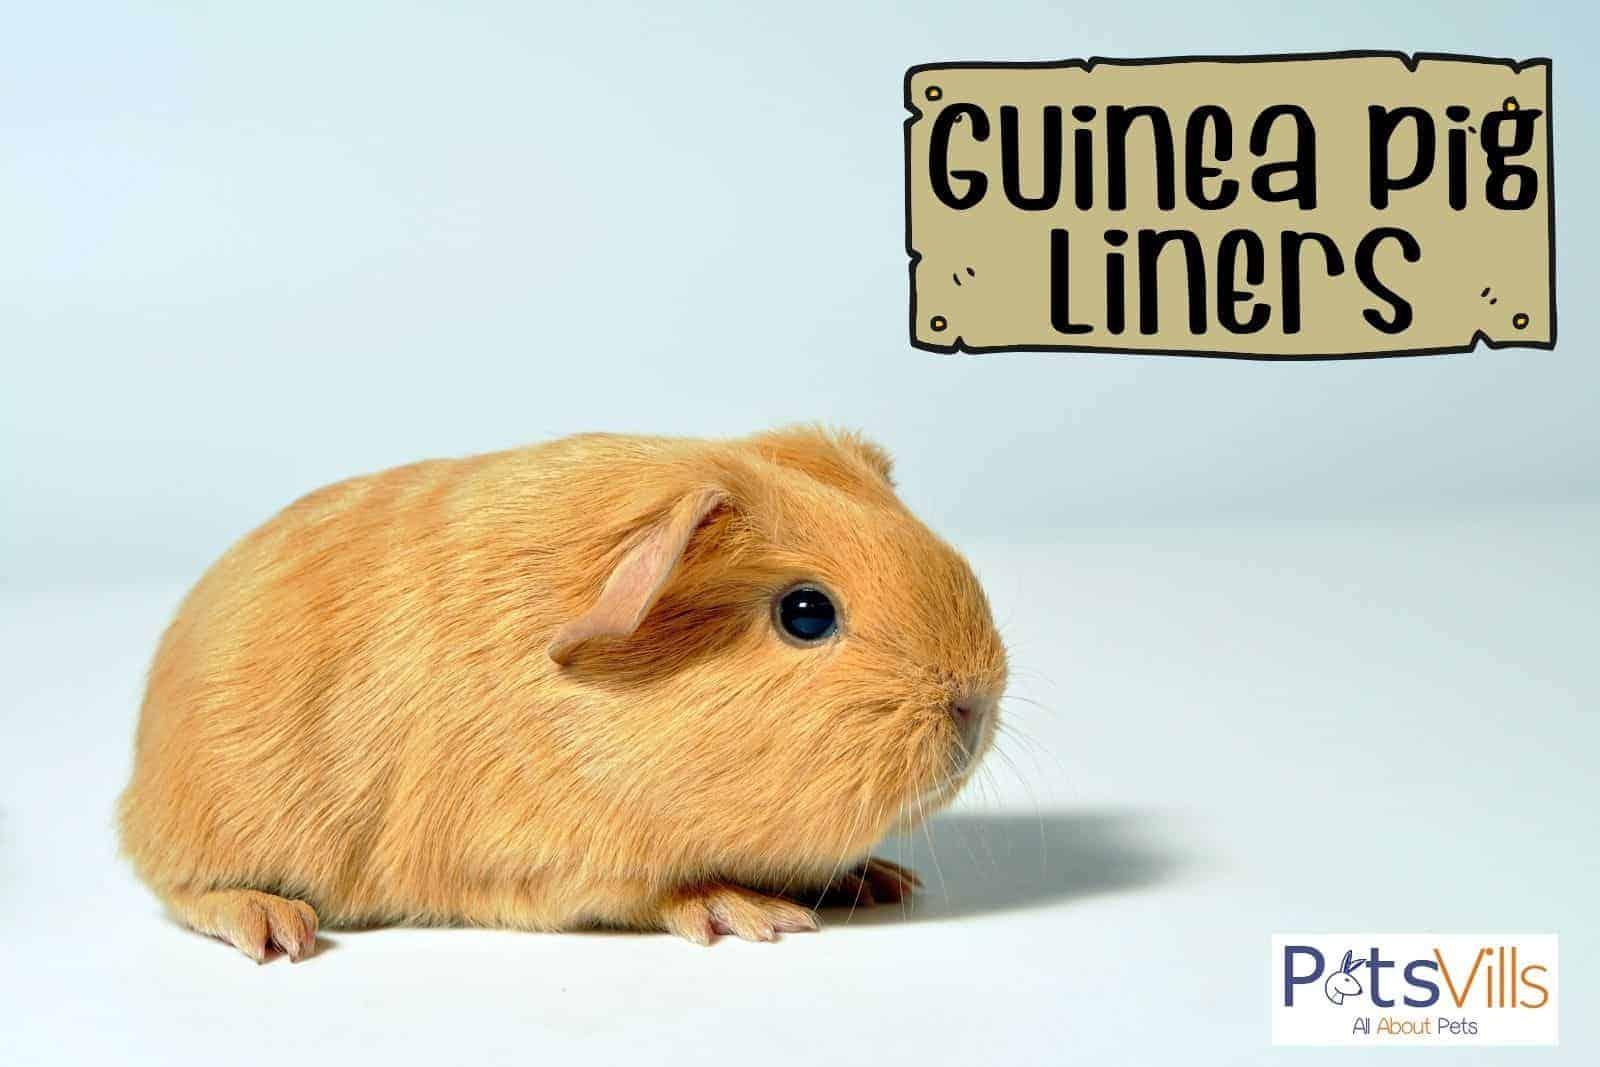 a cute brown guinea pig